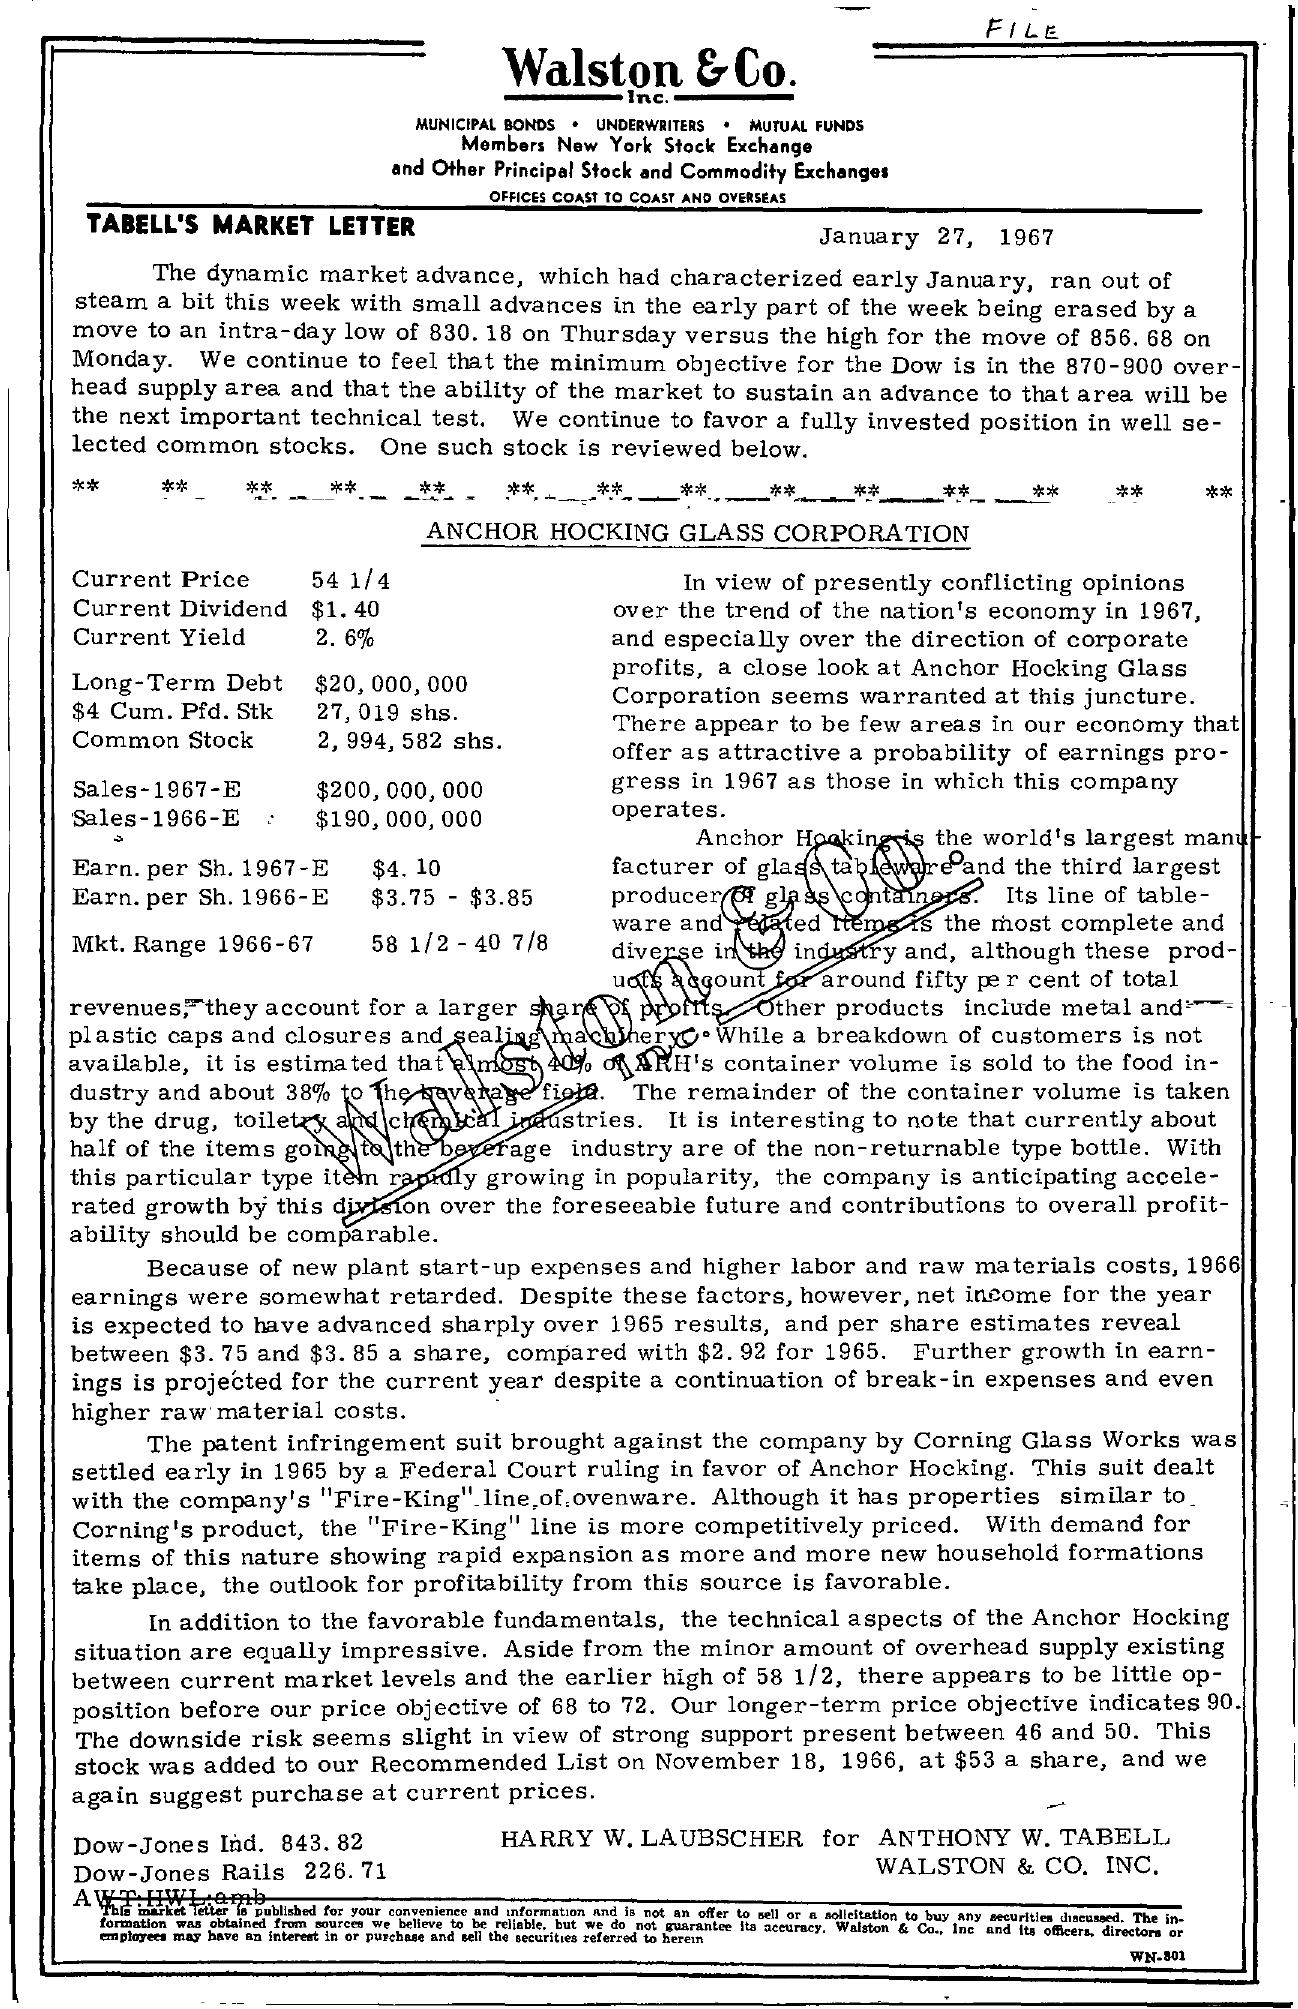 Tabell's Market Letter - January 27, 1967